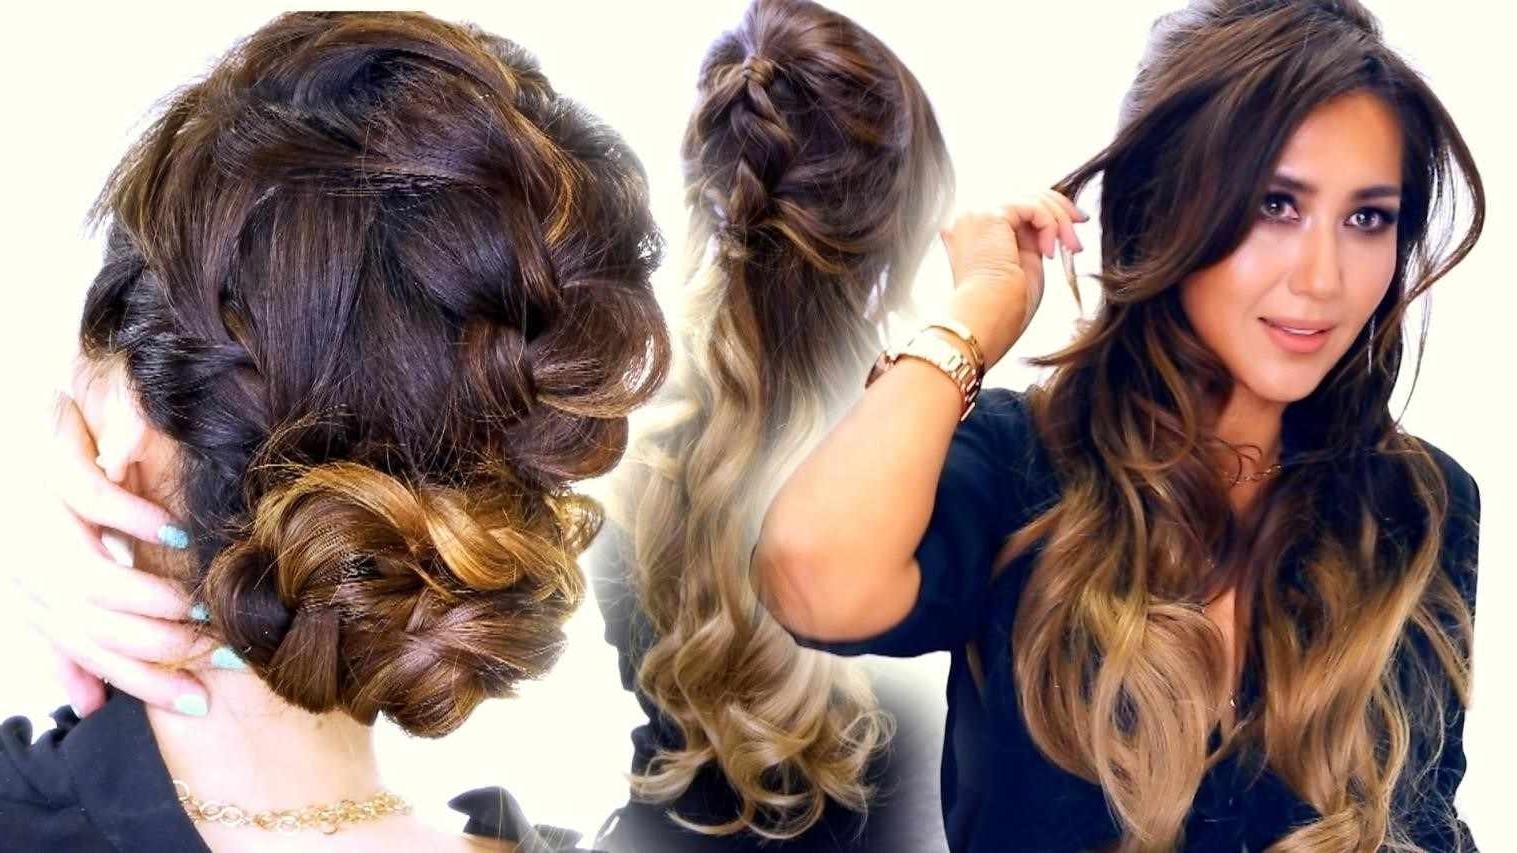 And More Rope Cute Bun Hairstyles With Braids Twisted Pinwheel Bun Regarding Cute Bun Updo Hairstyles (View 14 of 15)